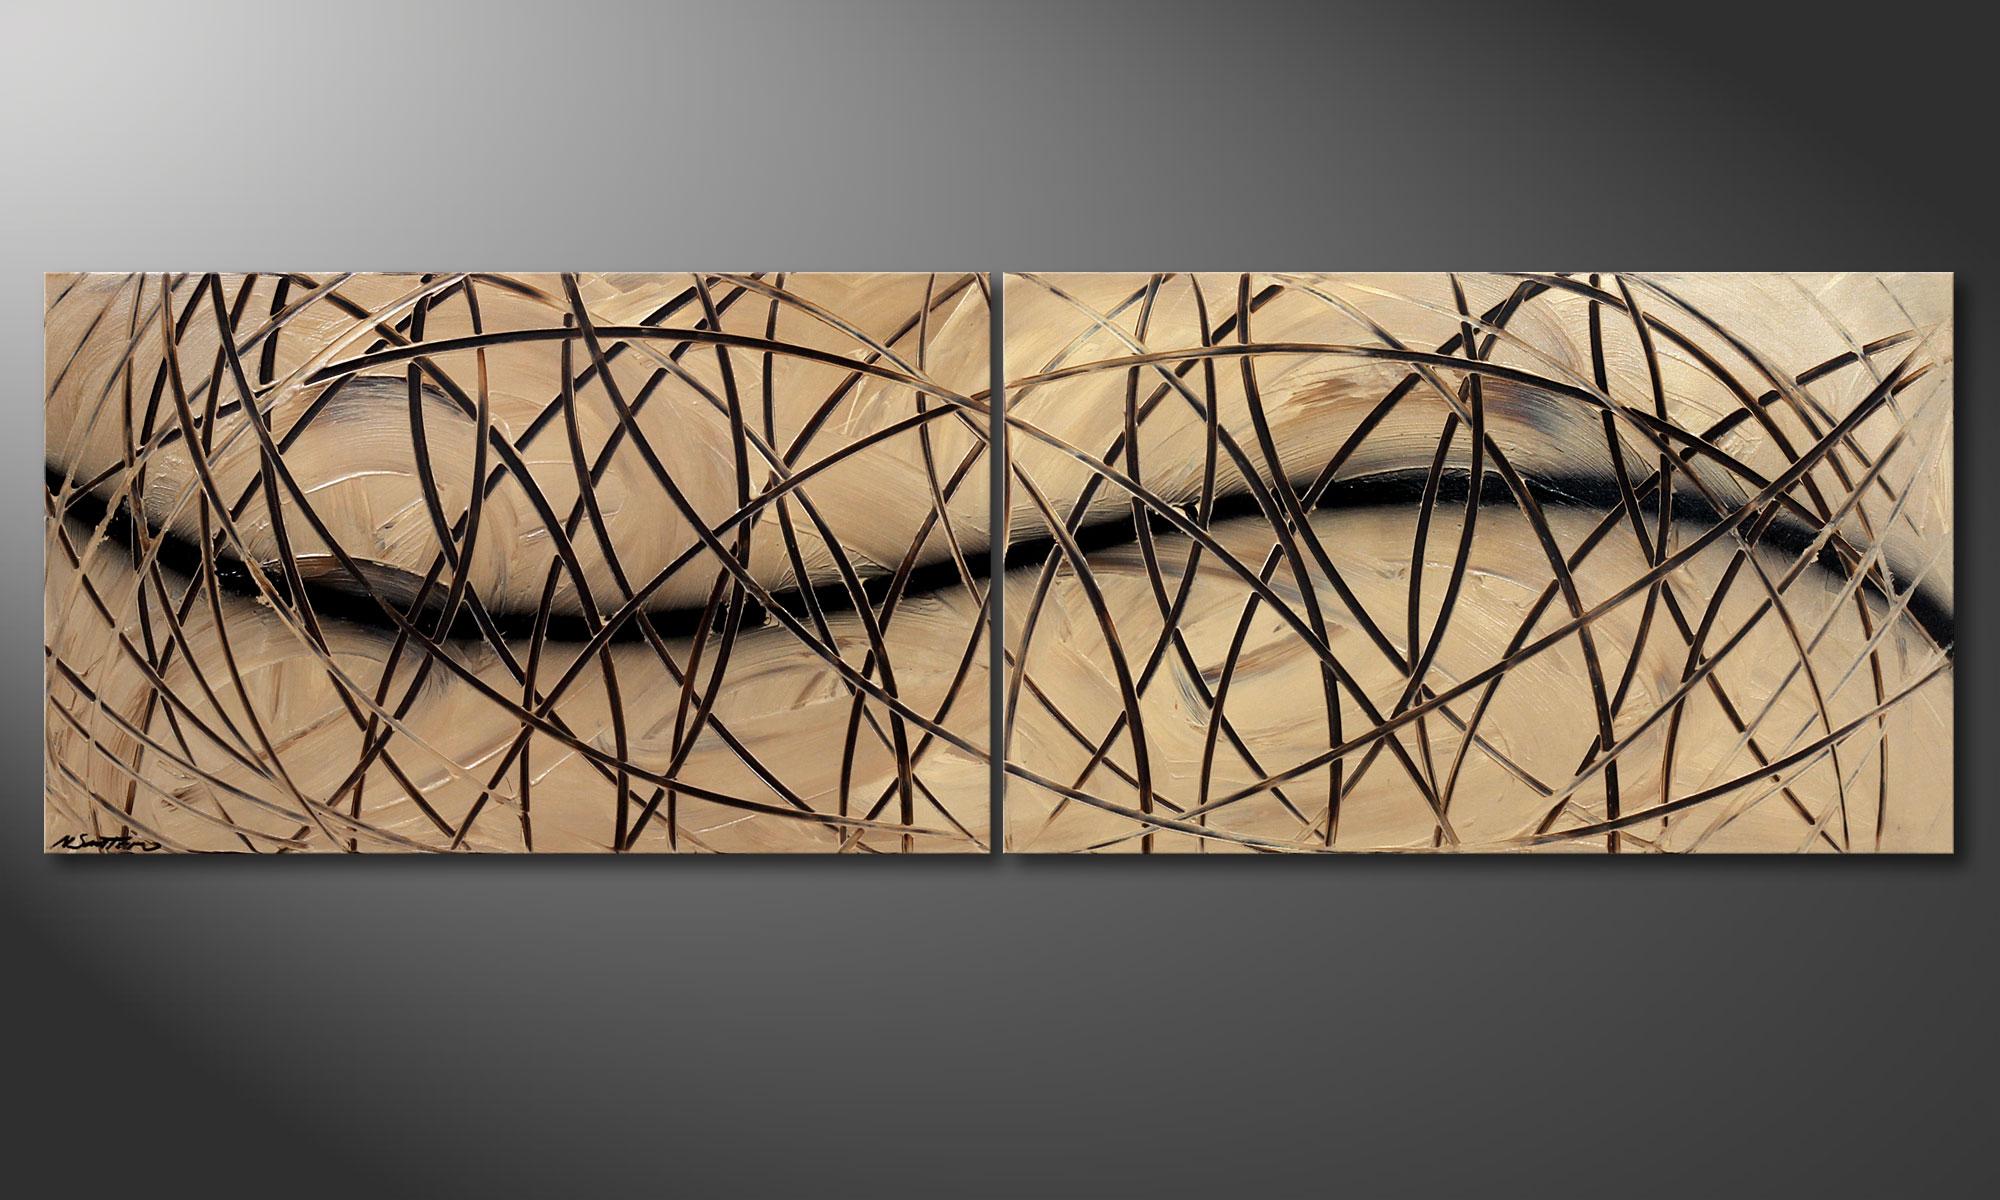 das acrylbild snow tempest 200x60cm wandbilder xxl. Black Bedroom Furniture Sets. Home Design Ideas